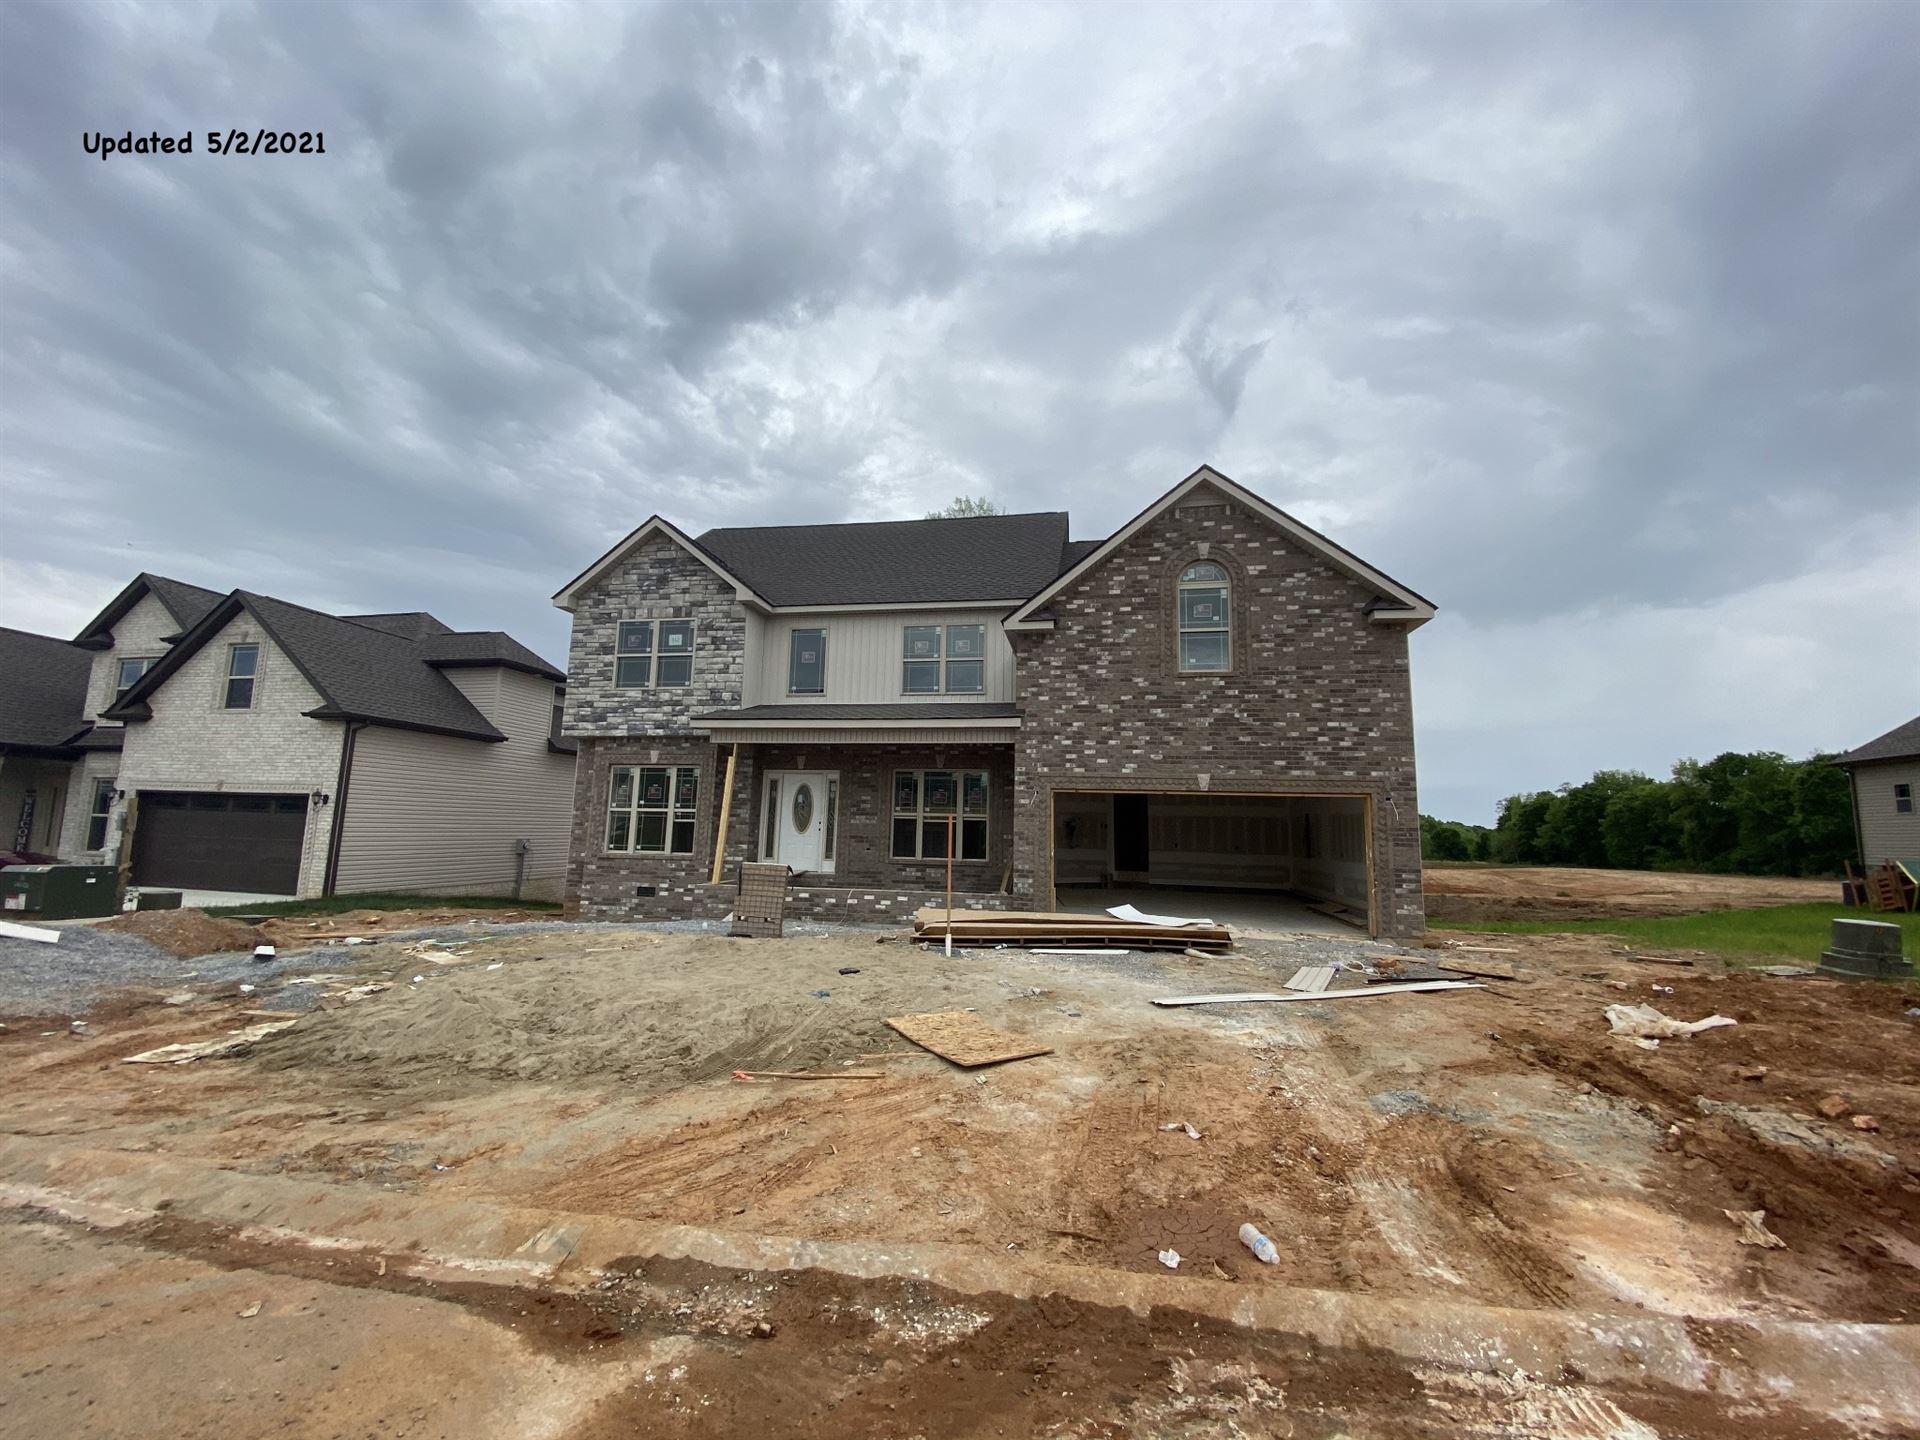 227 Griffey Estates Lot 227, Clarksville, TN 37042 - MLS#: 2209424